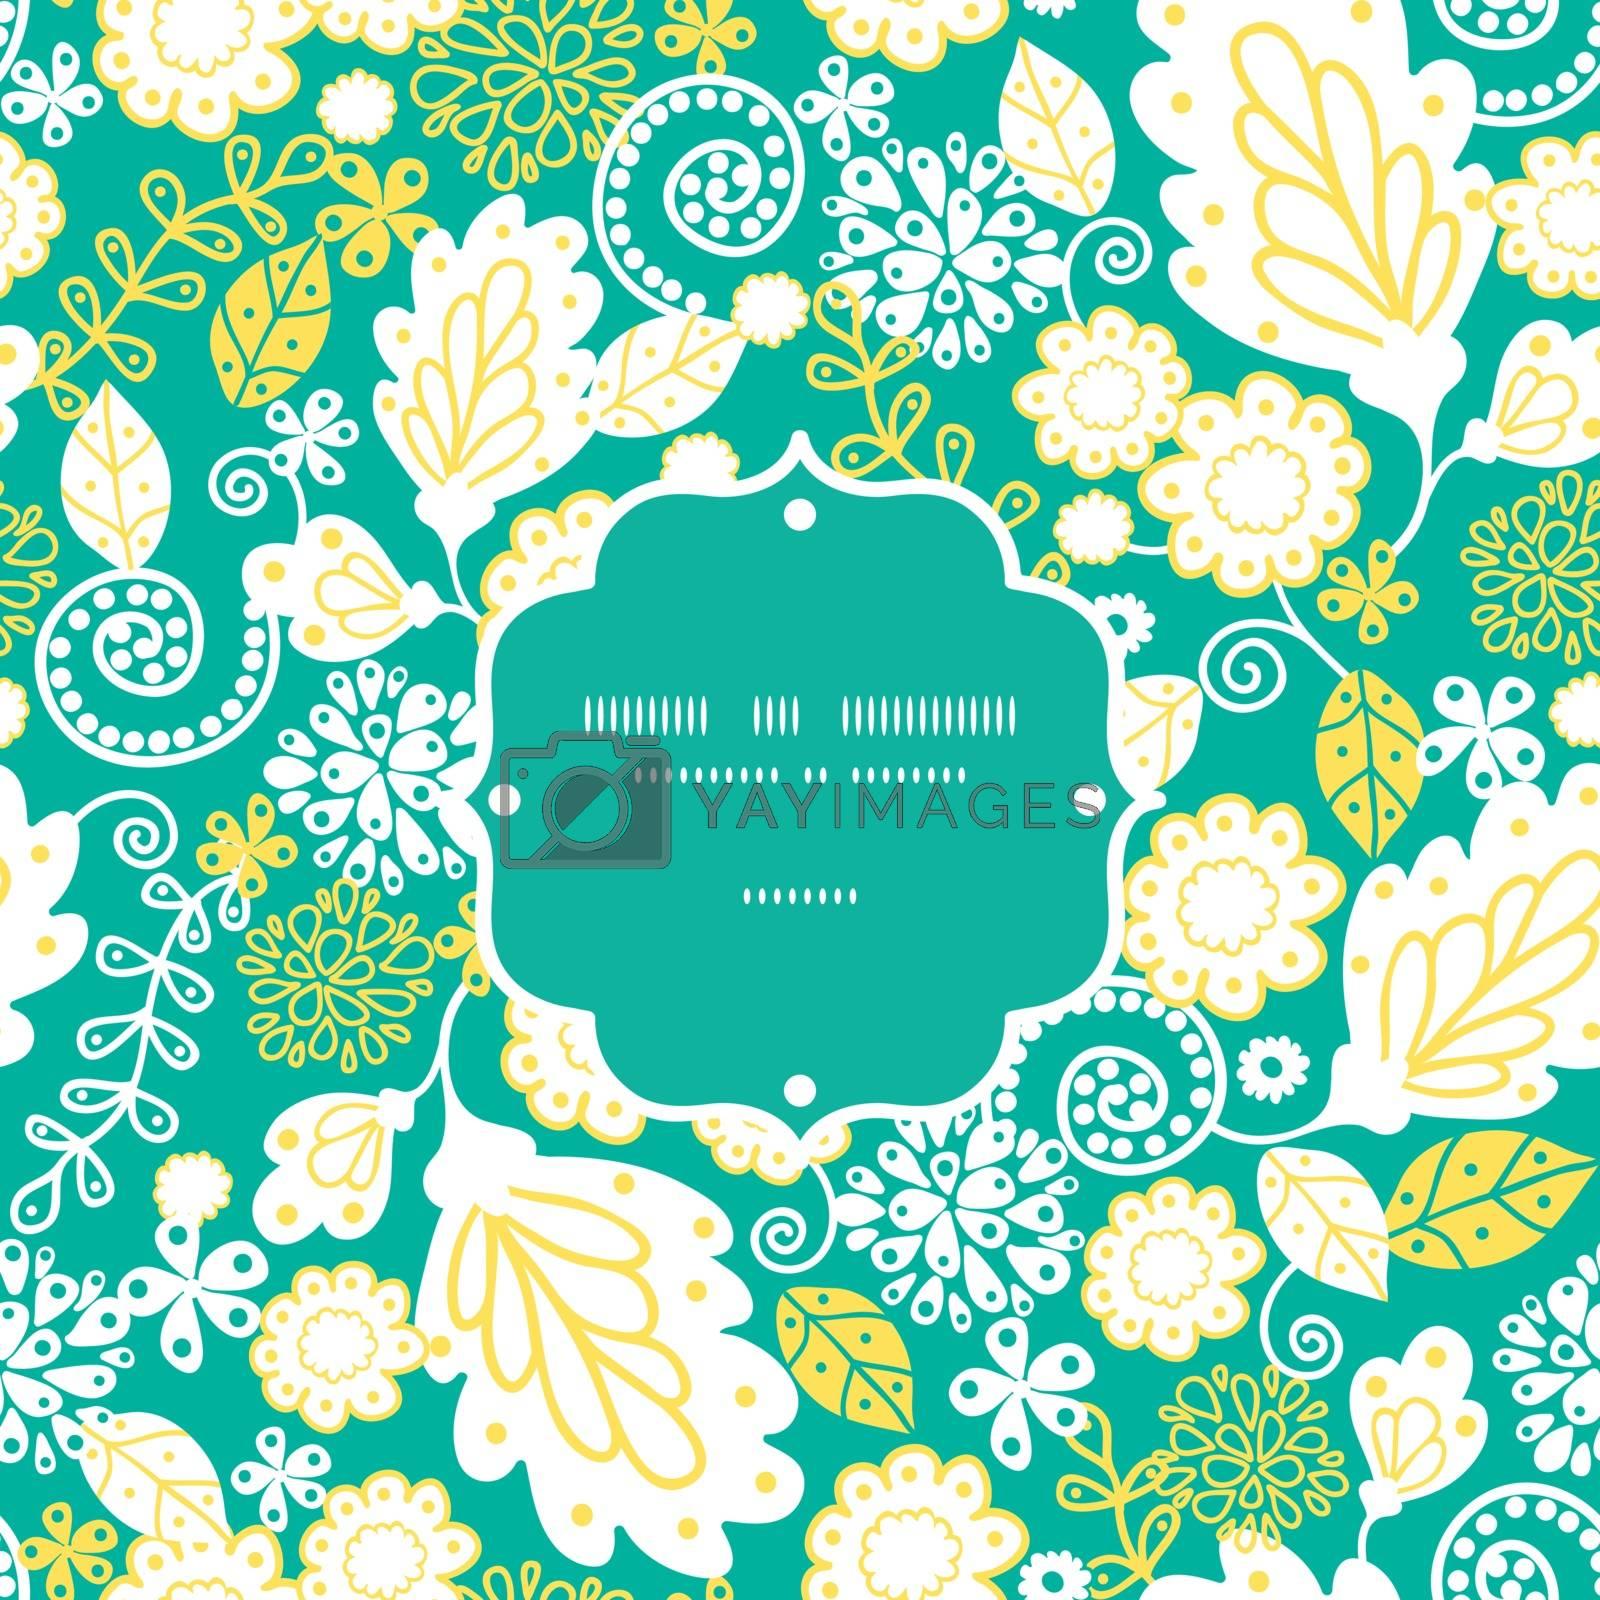 Vector emerald flowerals frame seamless pattern background graphic design